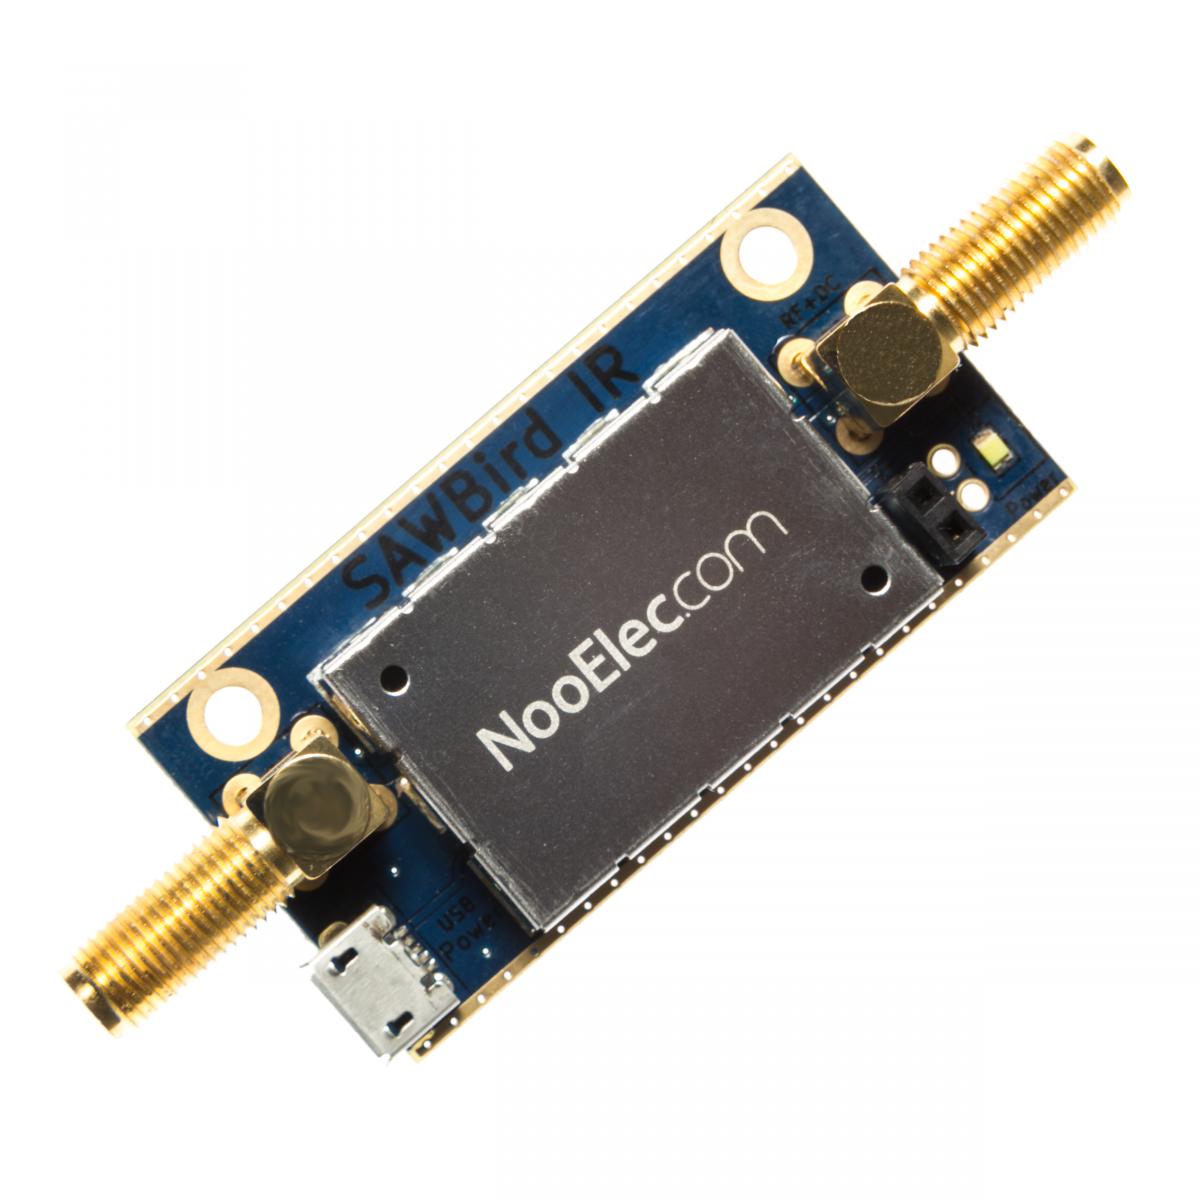 Nooelec SAWbird IR Barebones - Premium Dual Ultra-Low Noise Amplifier (LNA)  & SAW Filter Module for Iridium and Inmarsat Applications  1620MHz Center